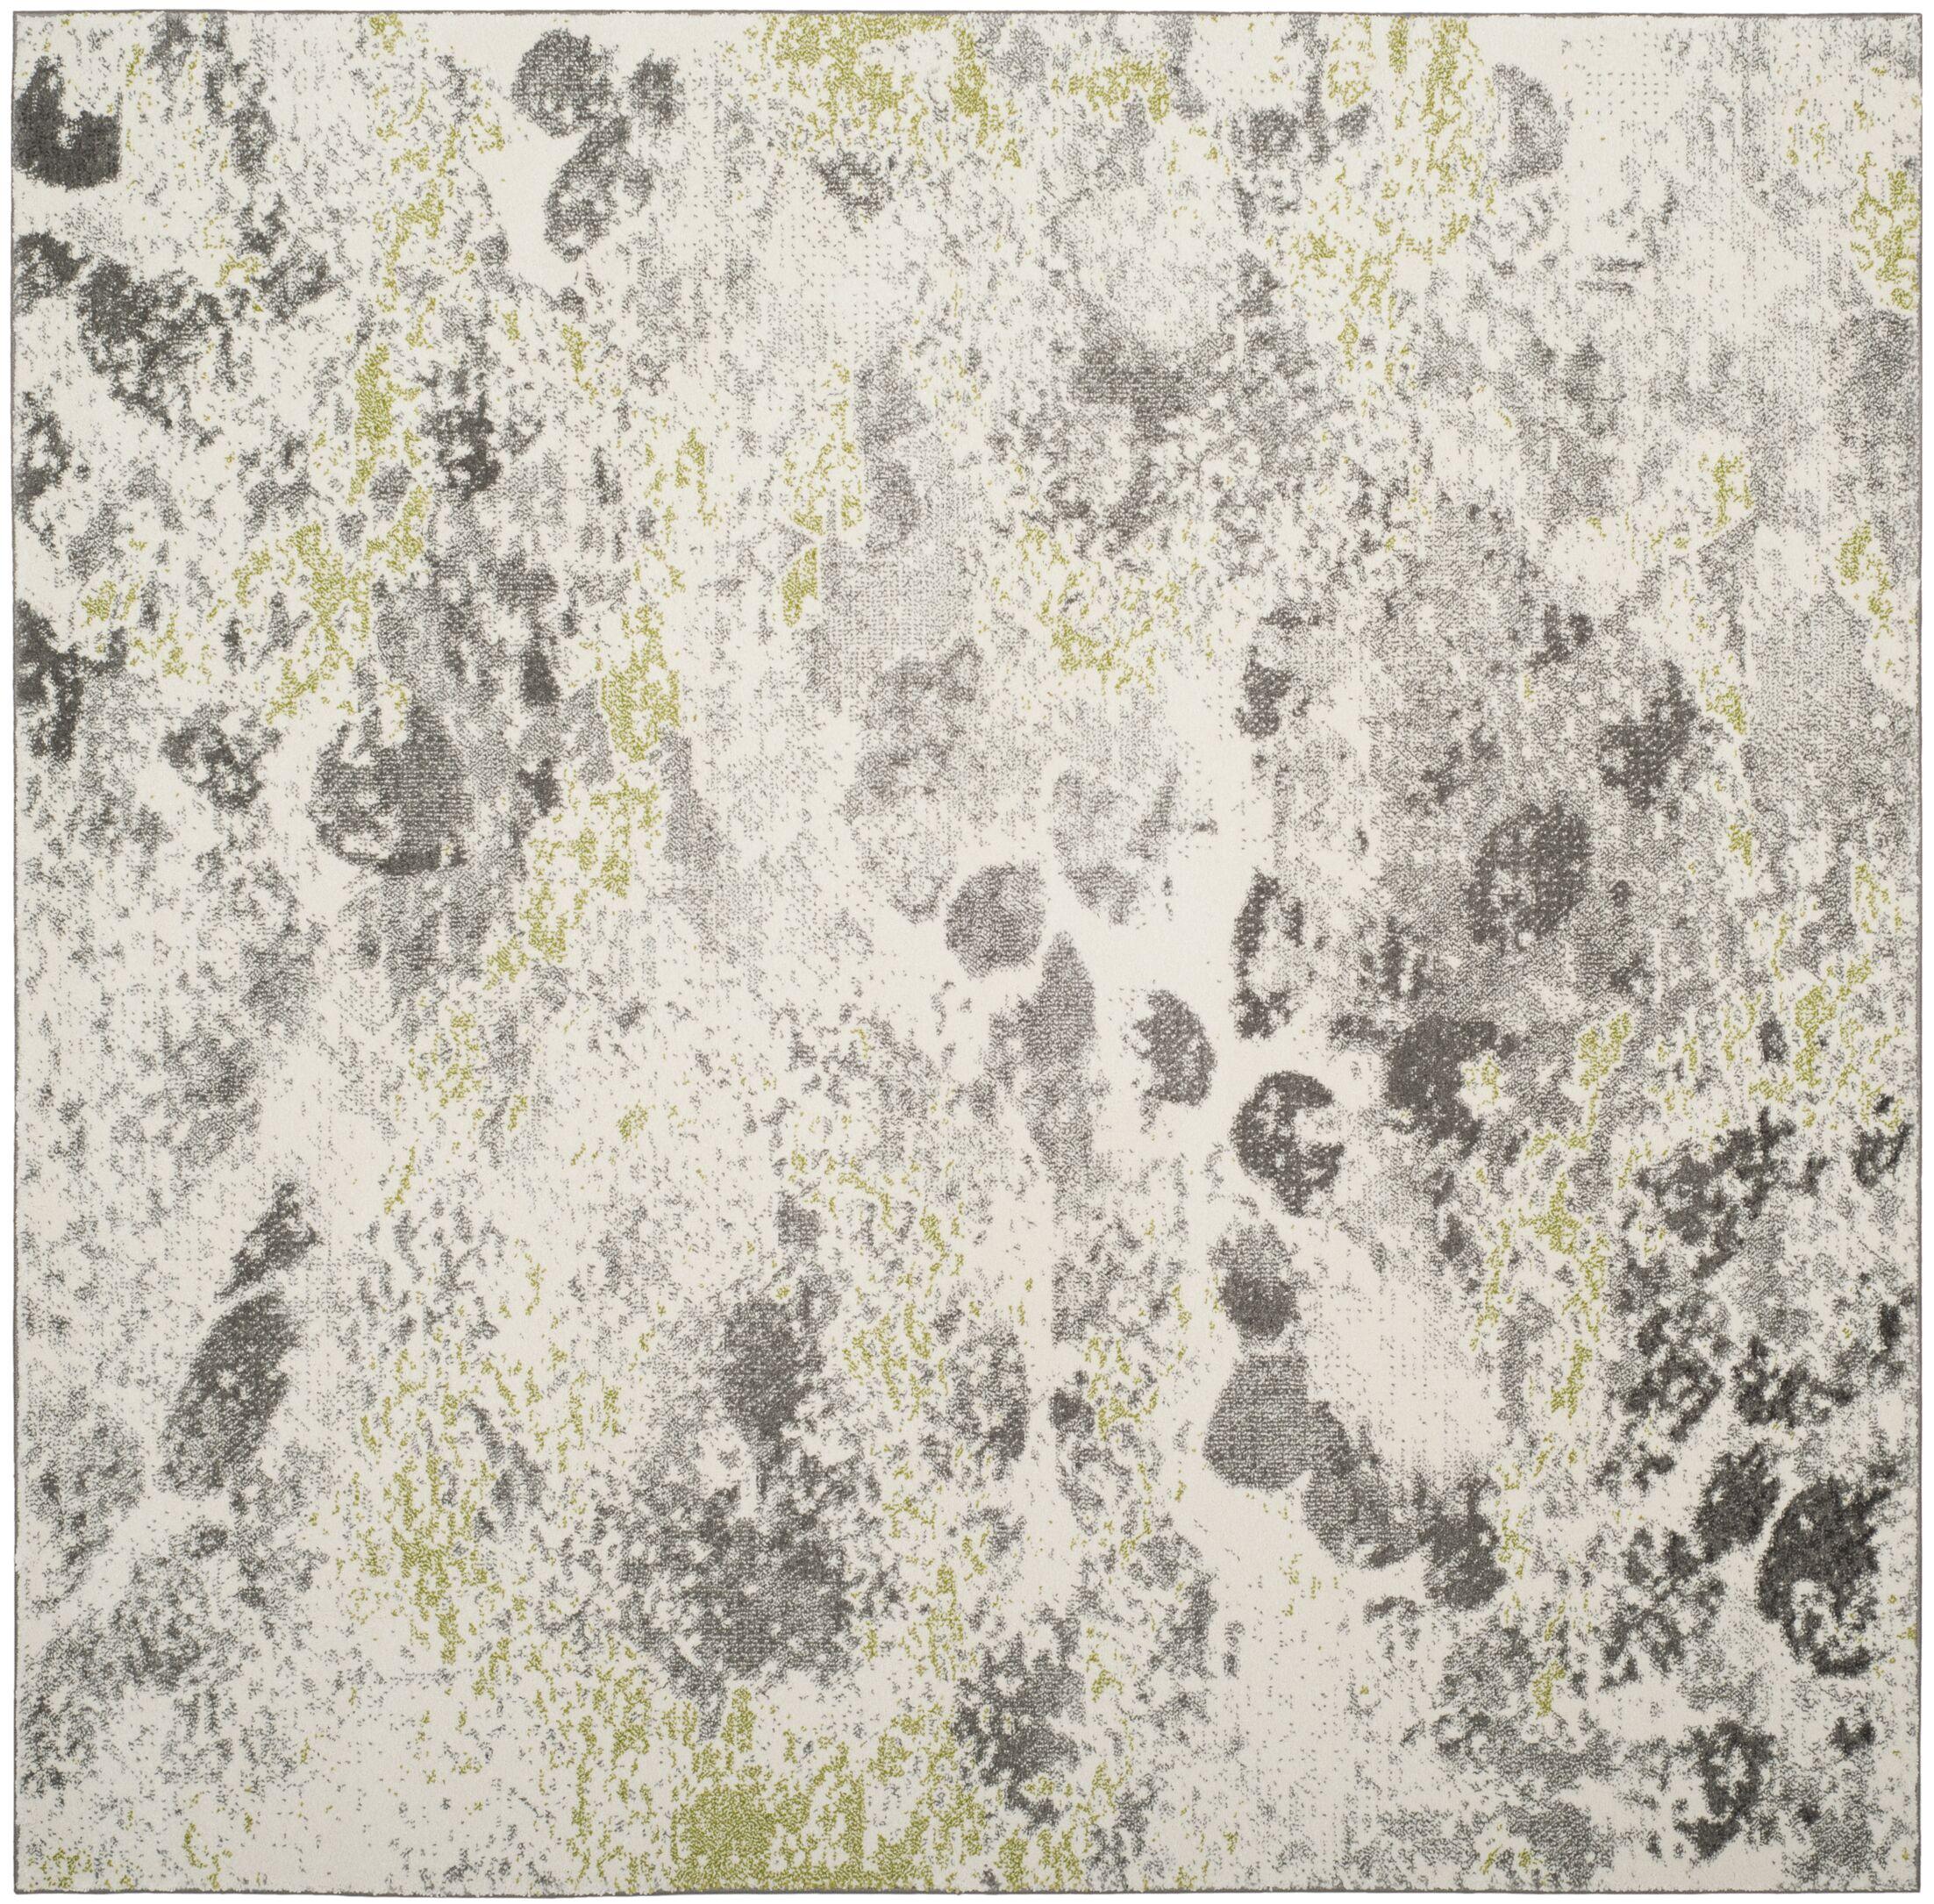 Seybert Beige/Gray Area Rug Rug Size: Square 6'7